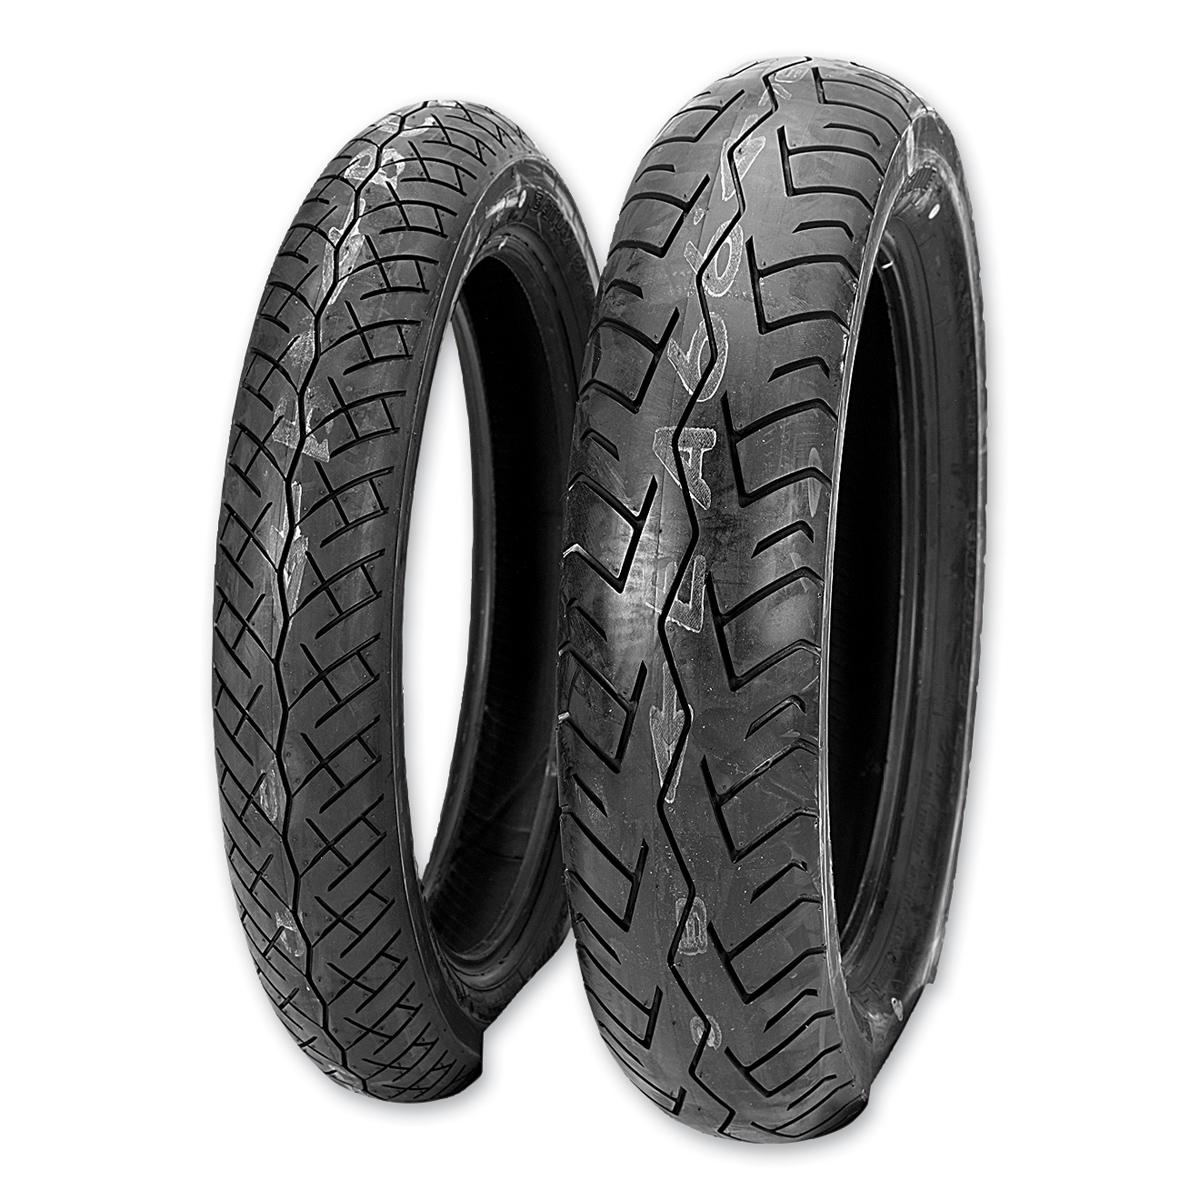 Bridgestone BT45R 130/70-17 Rear Tire